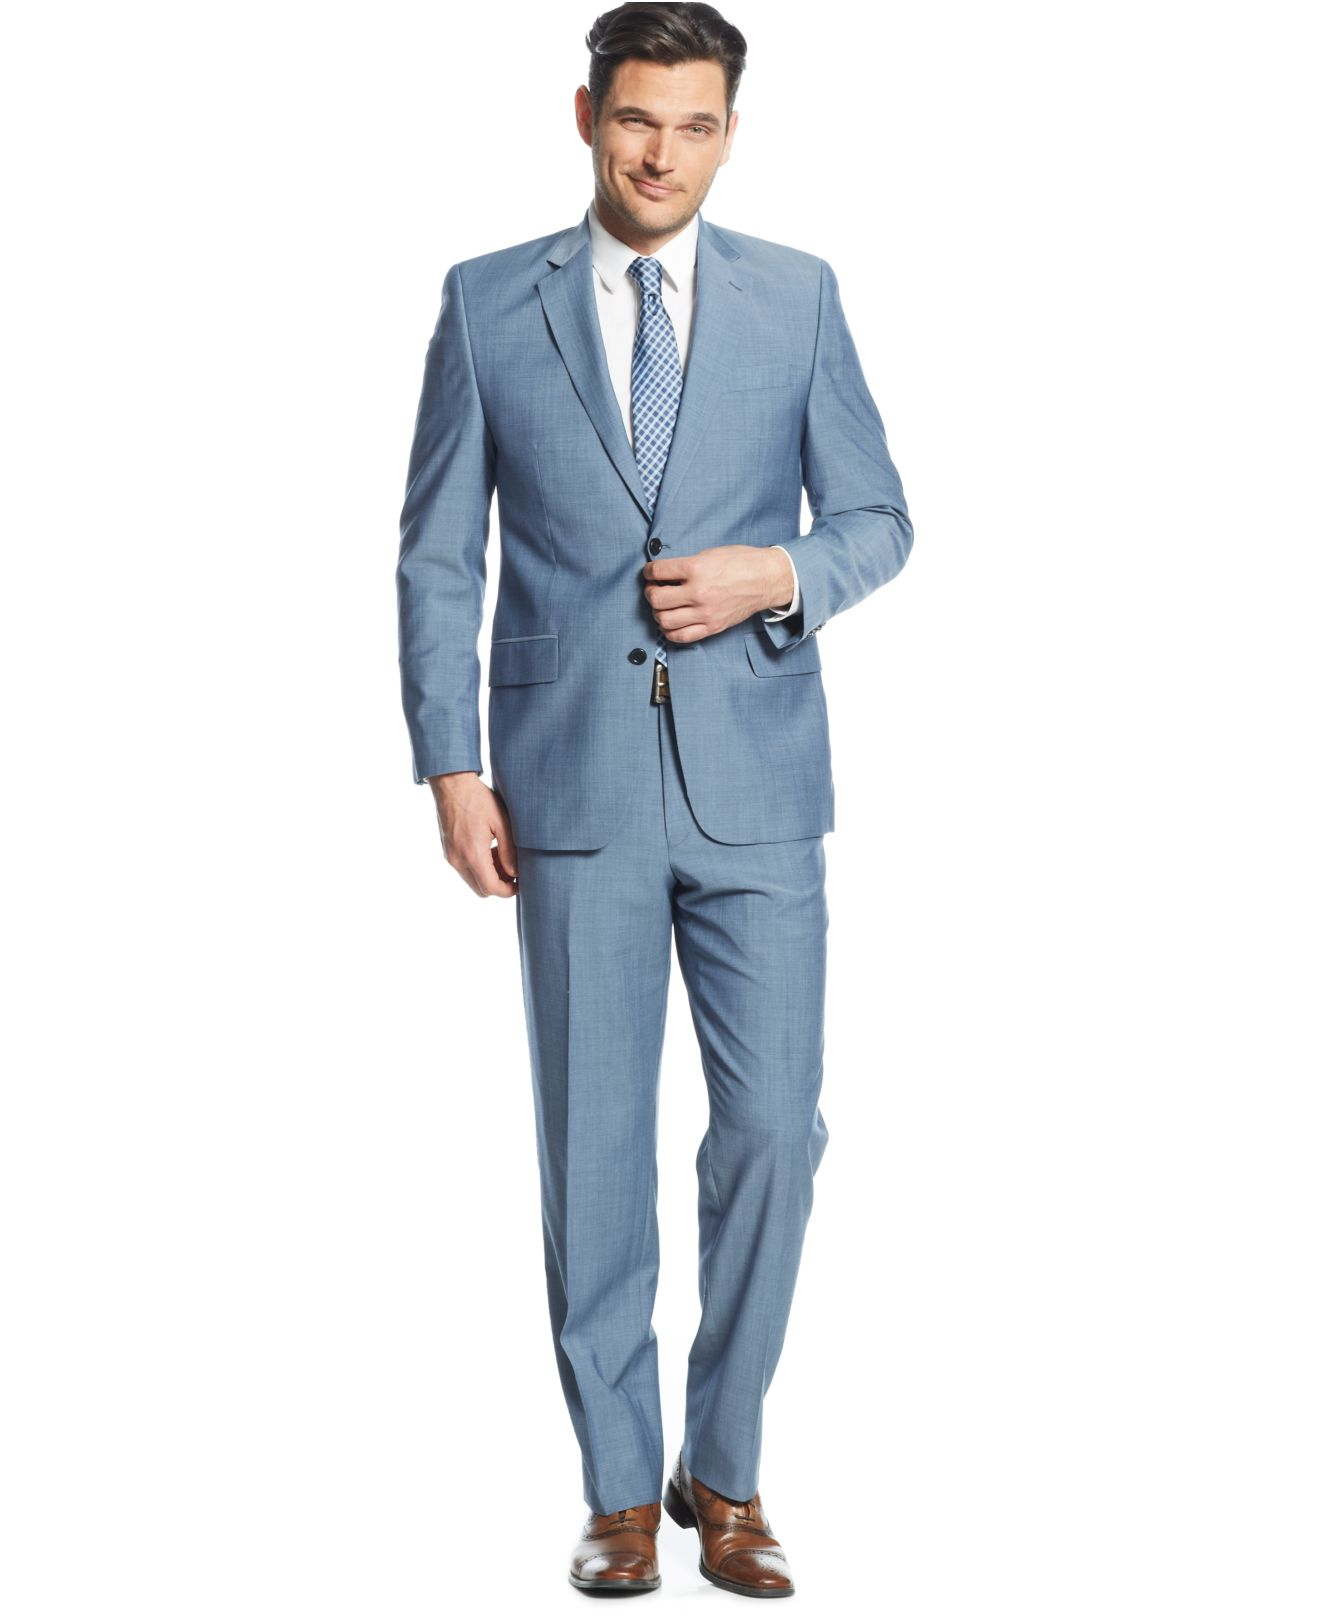 Lyst Michael Kors Michael Light Blue Sharkskin Suit In